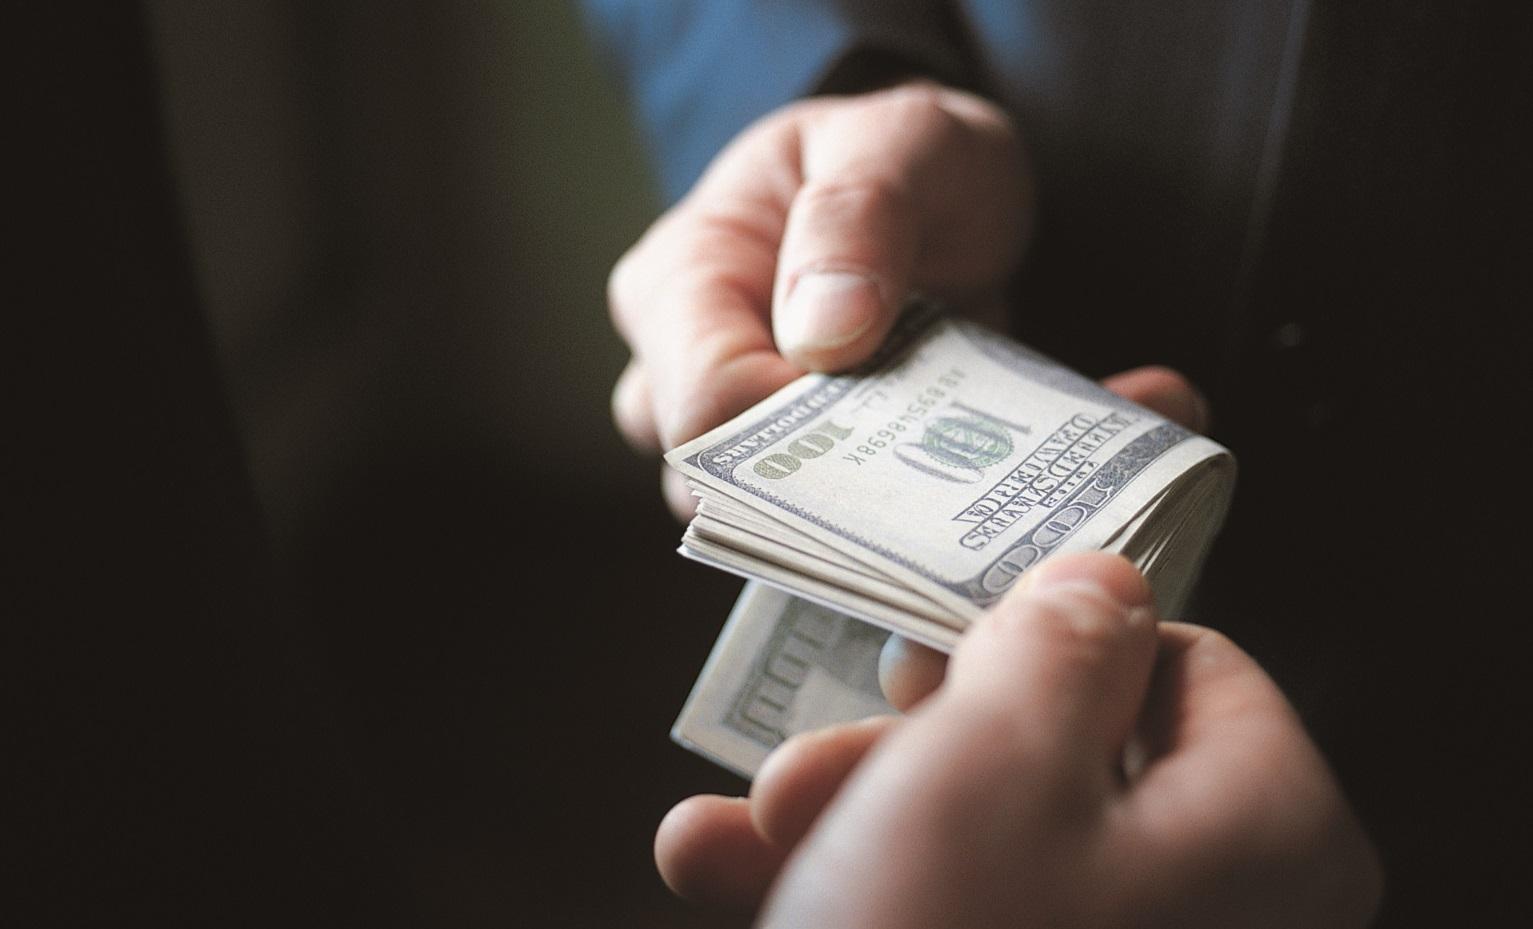 Коррупция, прихватизация, пятая колонна